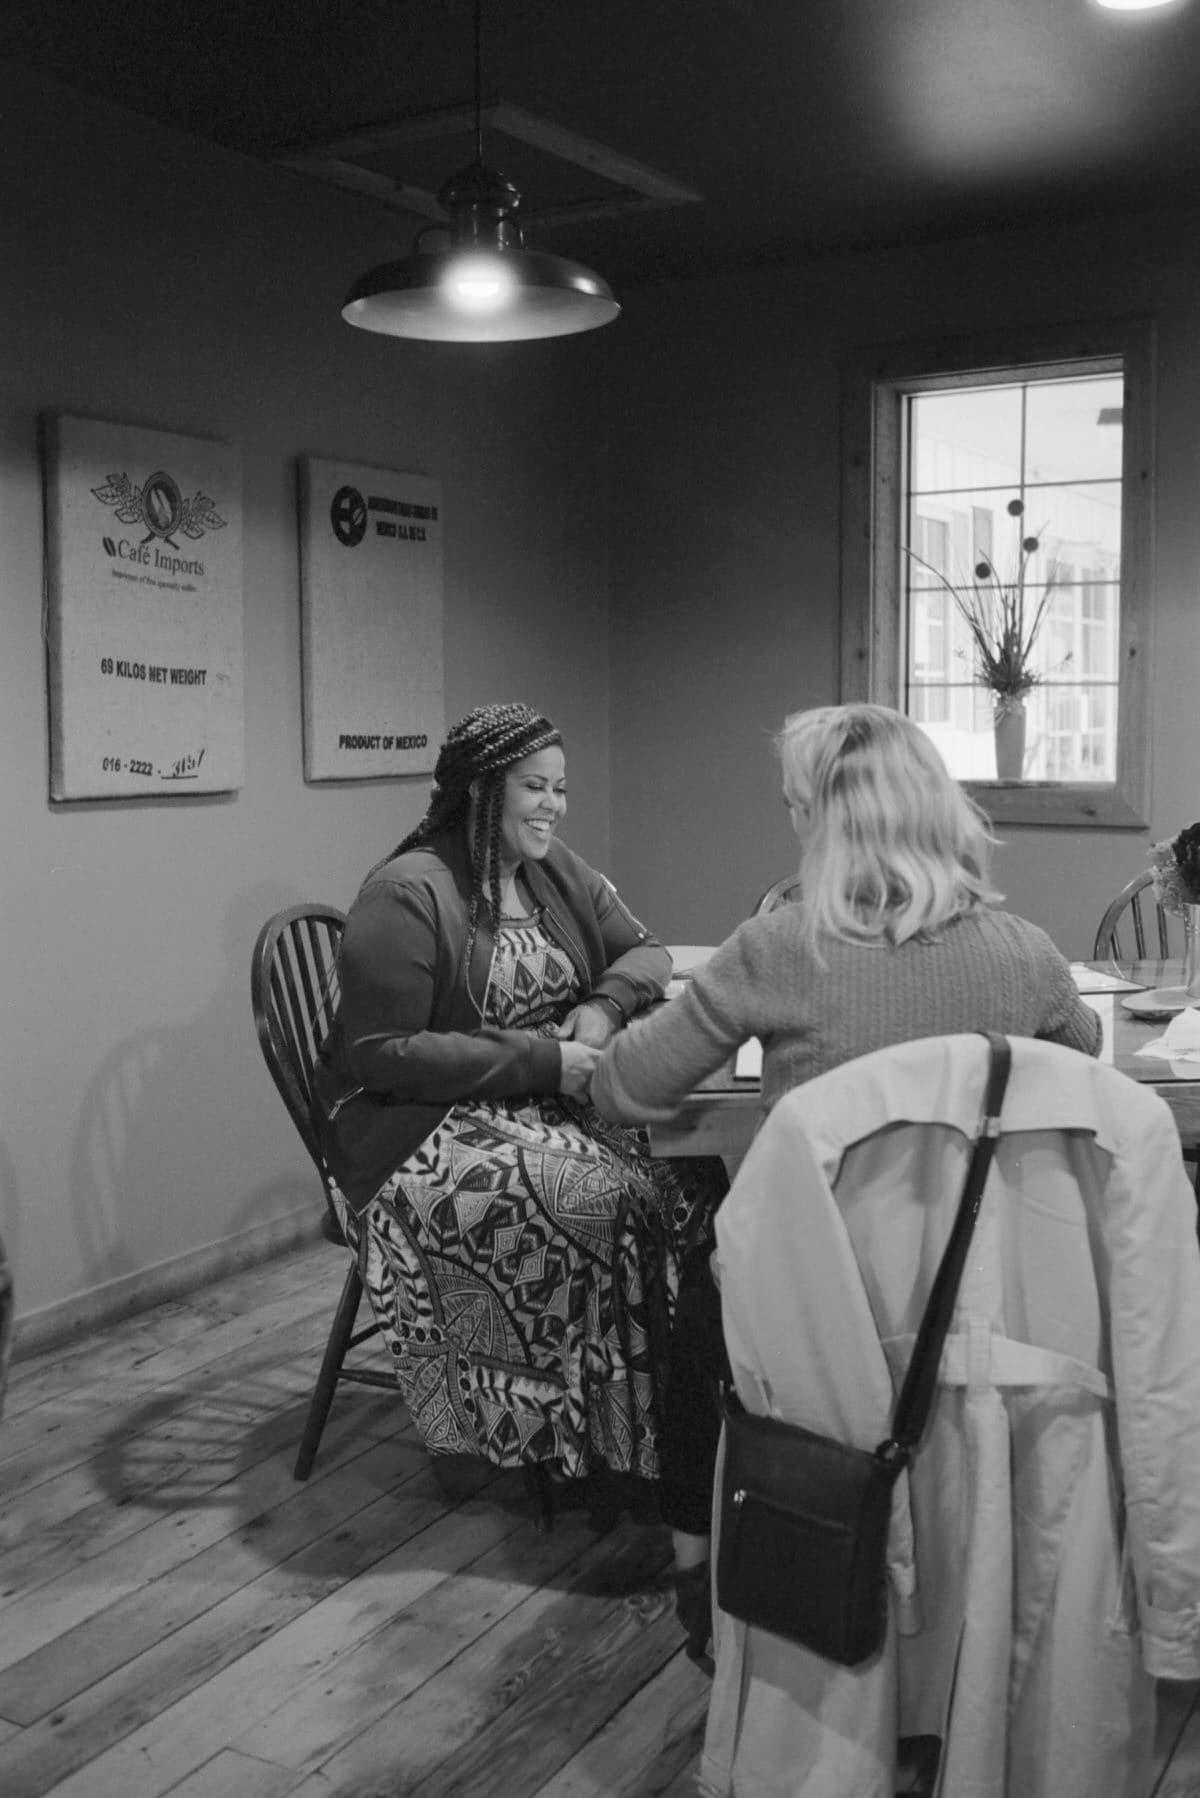 Illuminating-Women-art-exhibition-black-and-white-fine-art-film-photography-by-Studio-L-photographer-Laura-Schneider-030